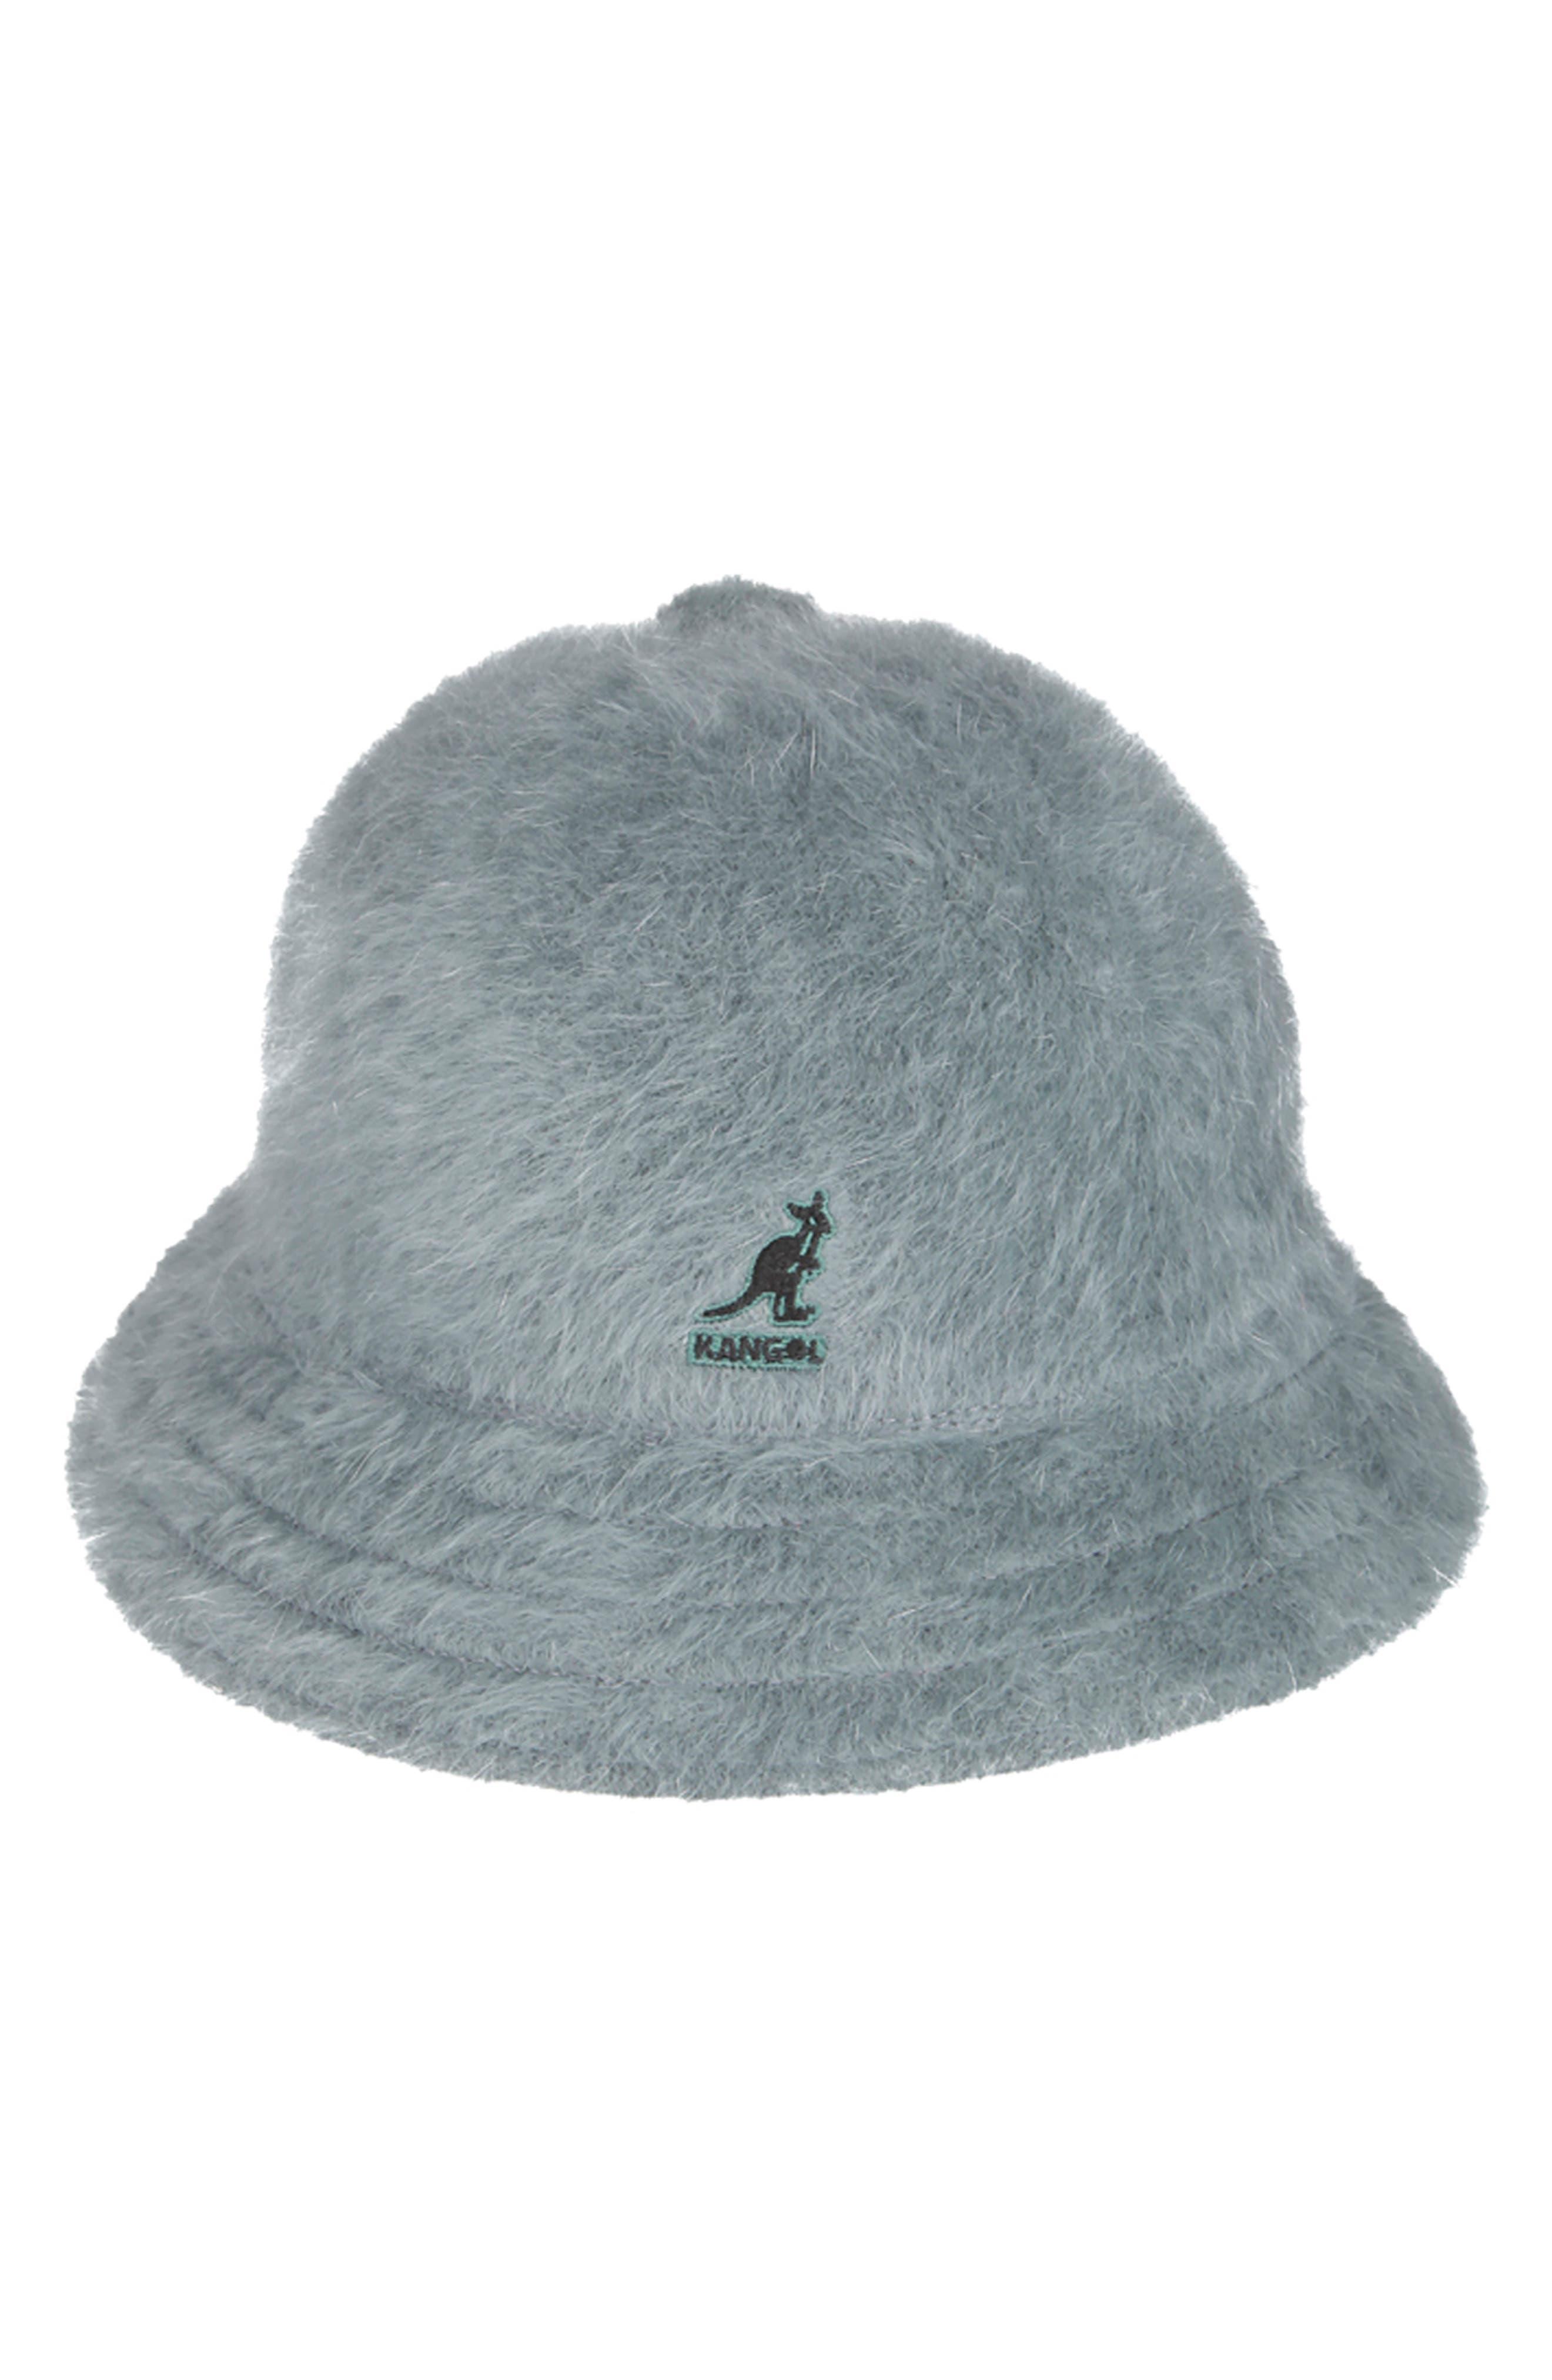 KANGOL Furgora Casual Bucket Hat - Grey in Slate Grey